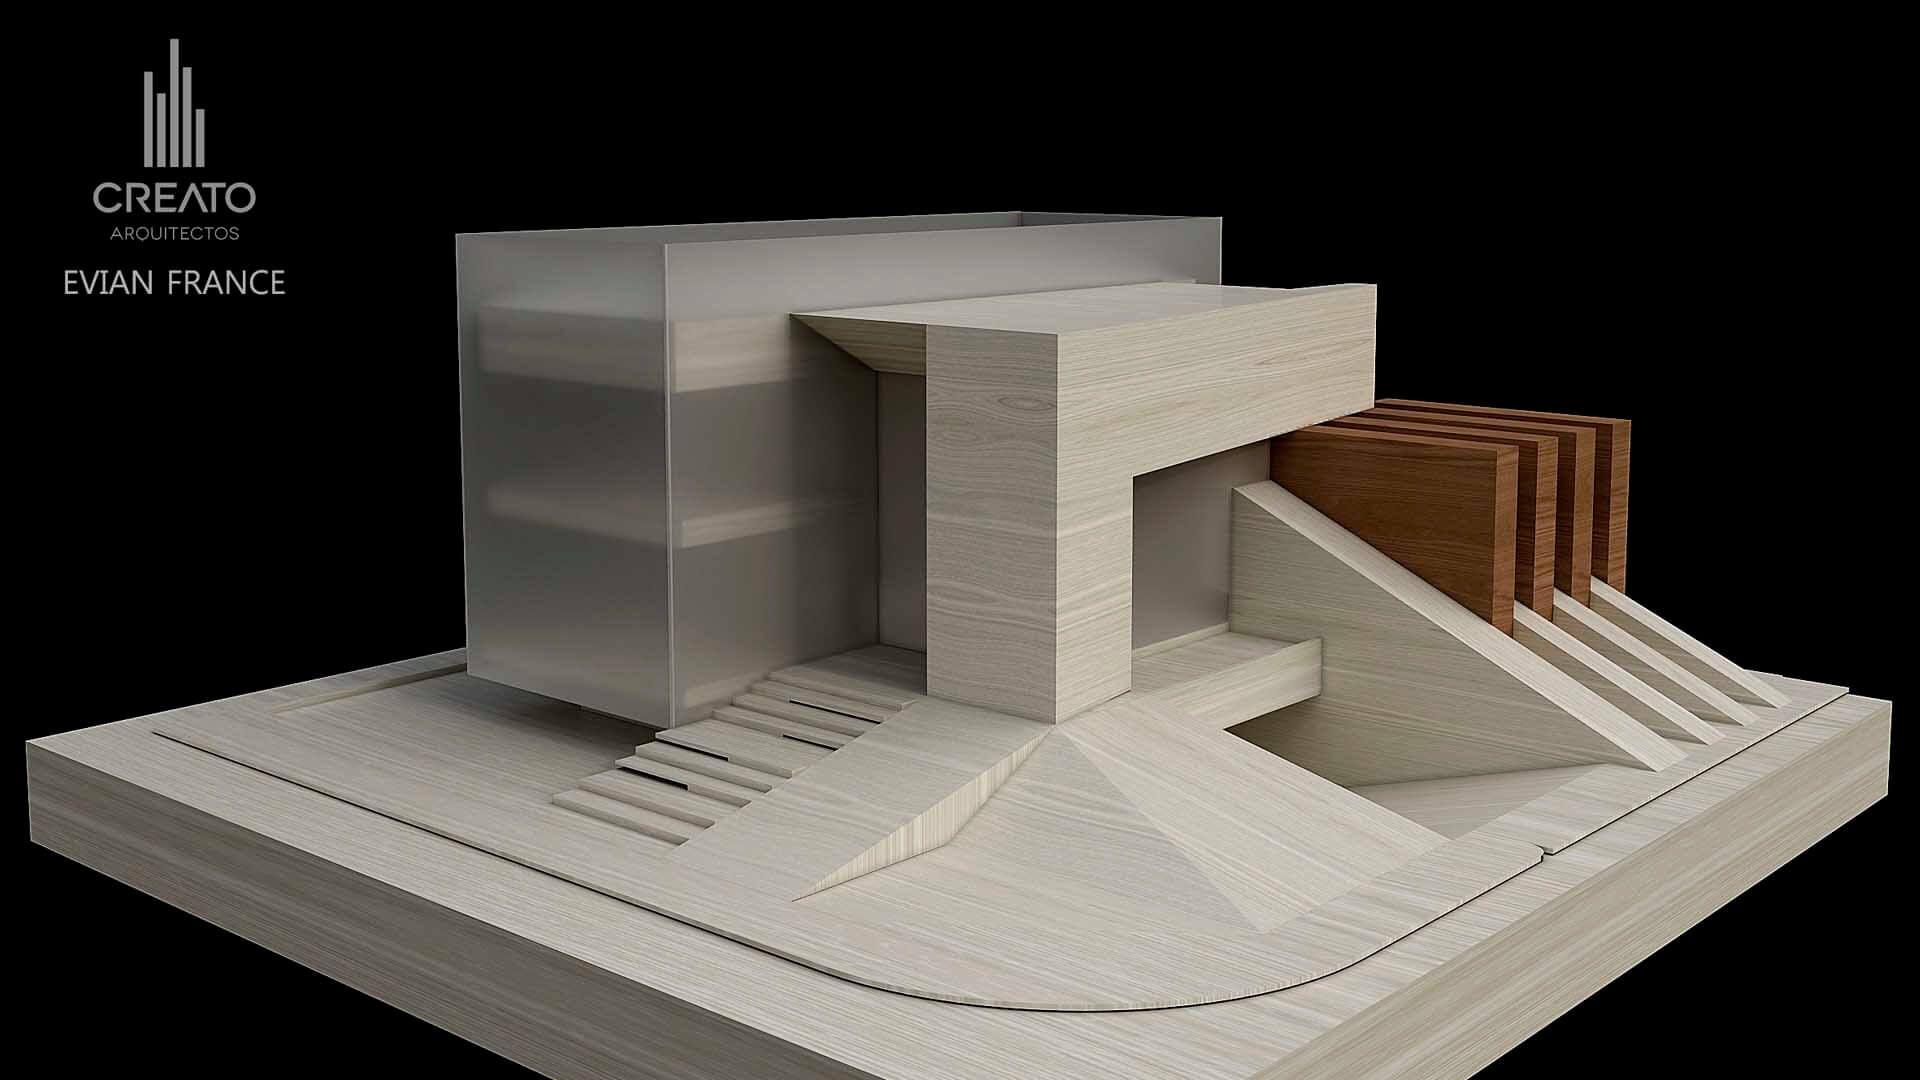 Creato projects evian gate maquetas modelos for Casa minimalista maqueta